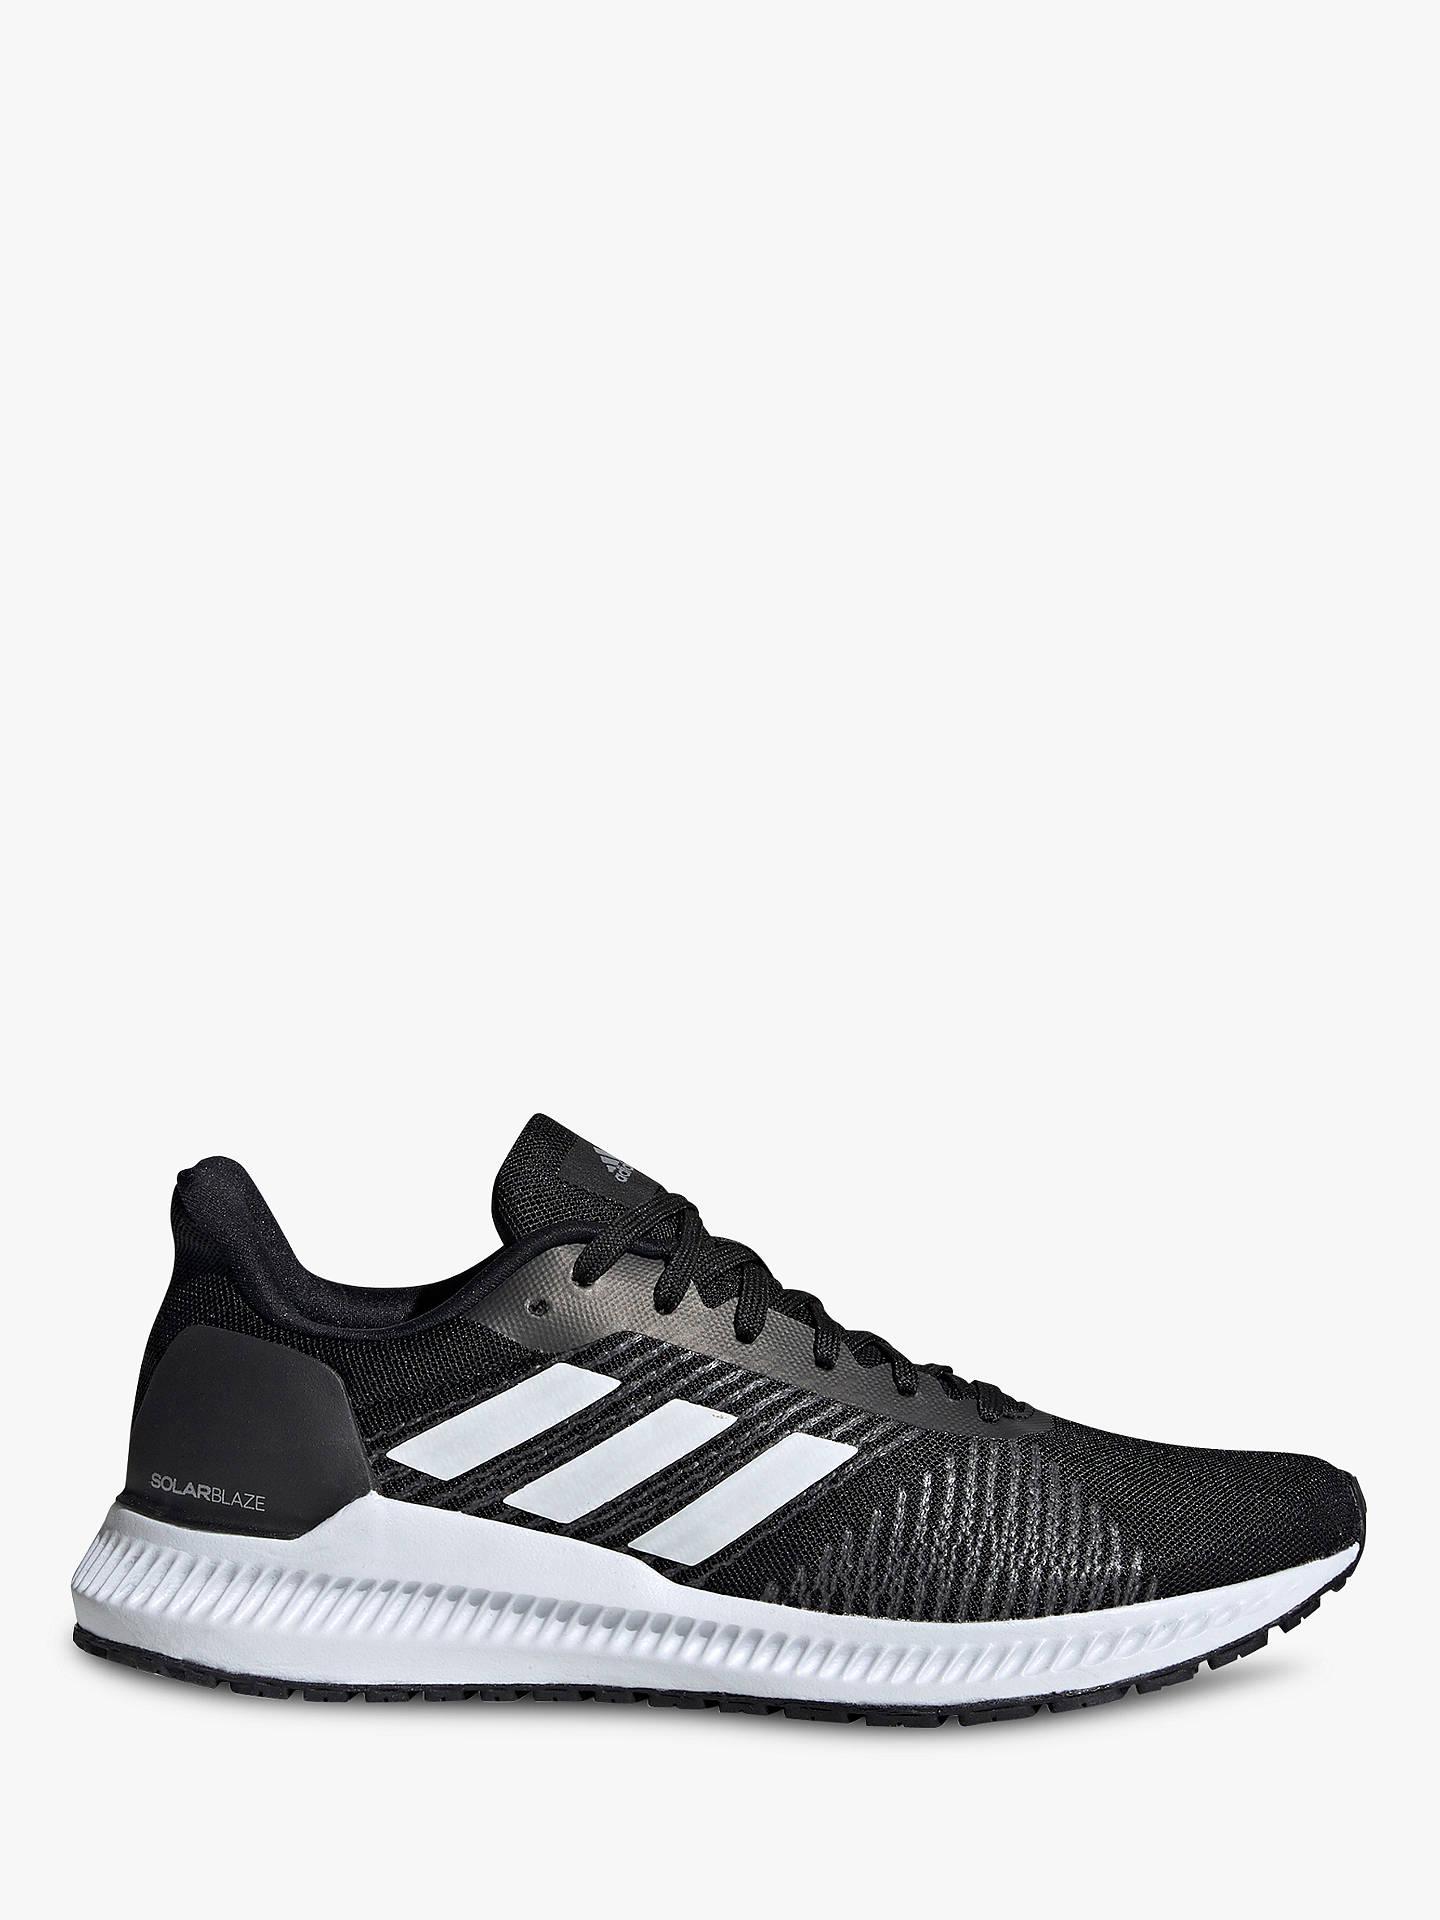 f56e276dcbf71 Buy adidas Solar Blaze Women s Running Shoes